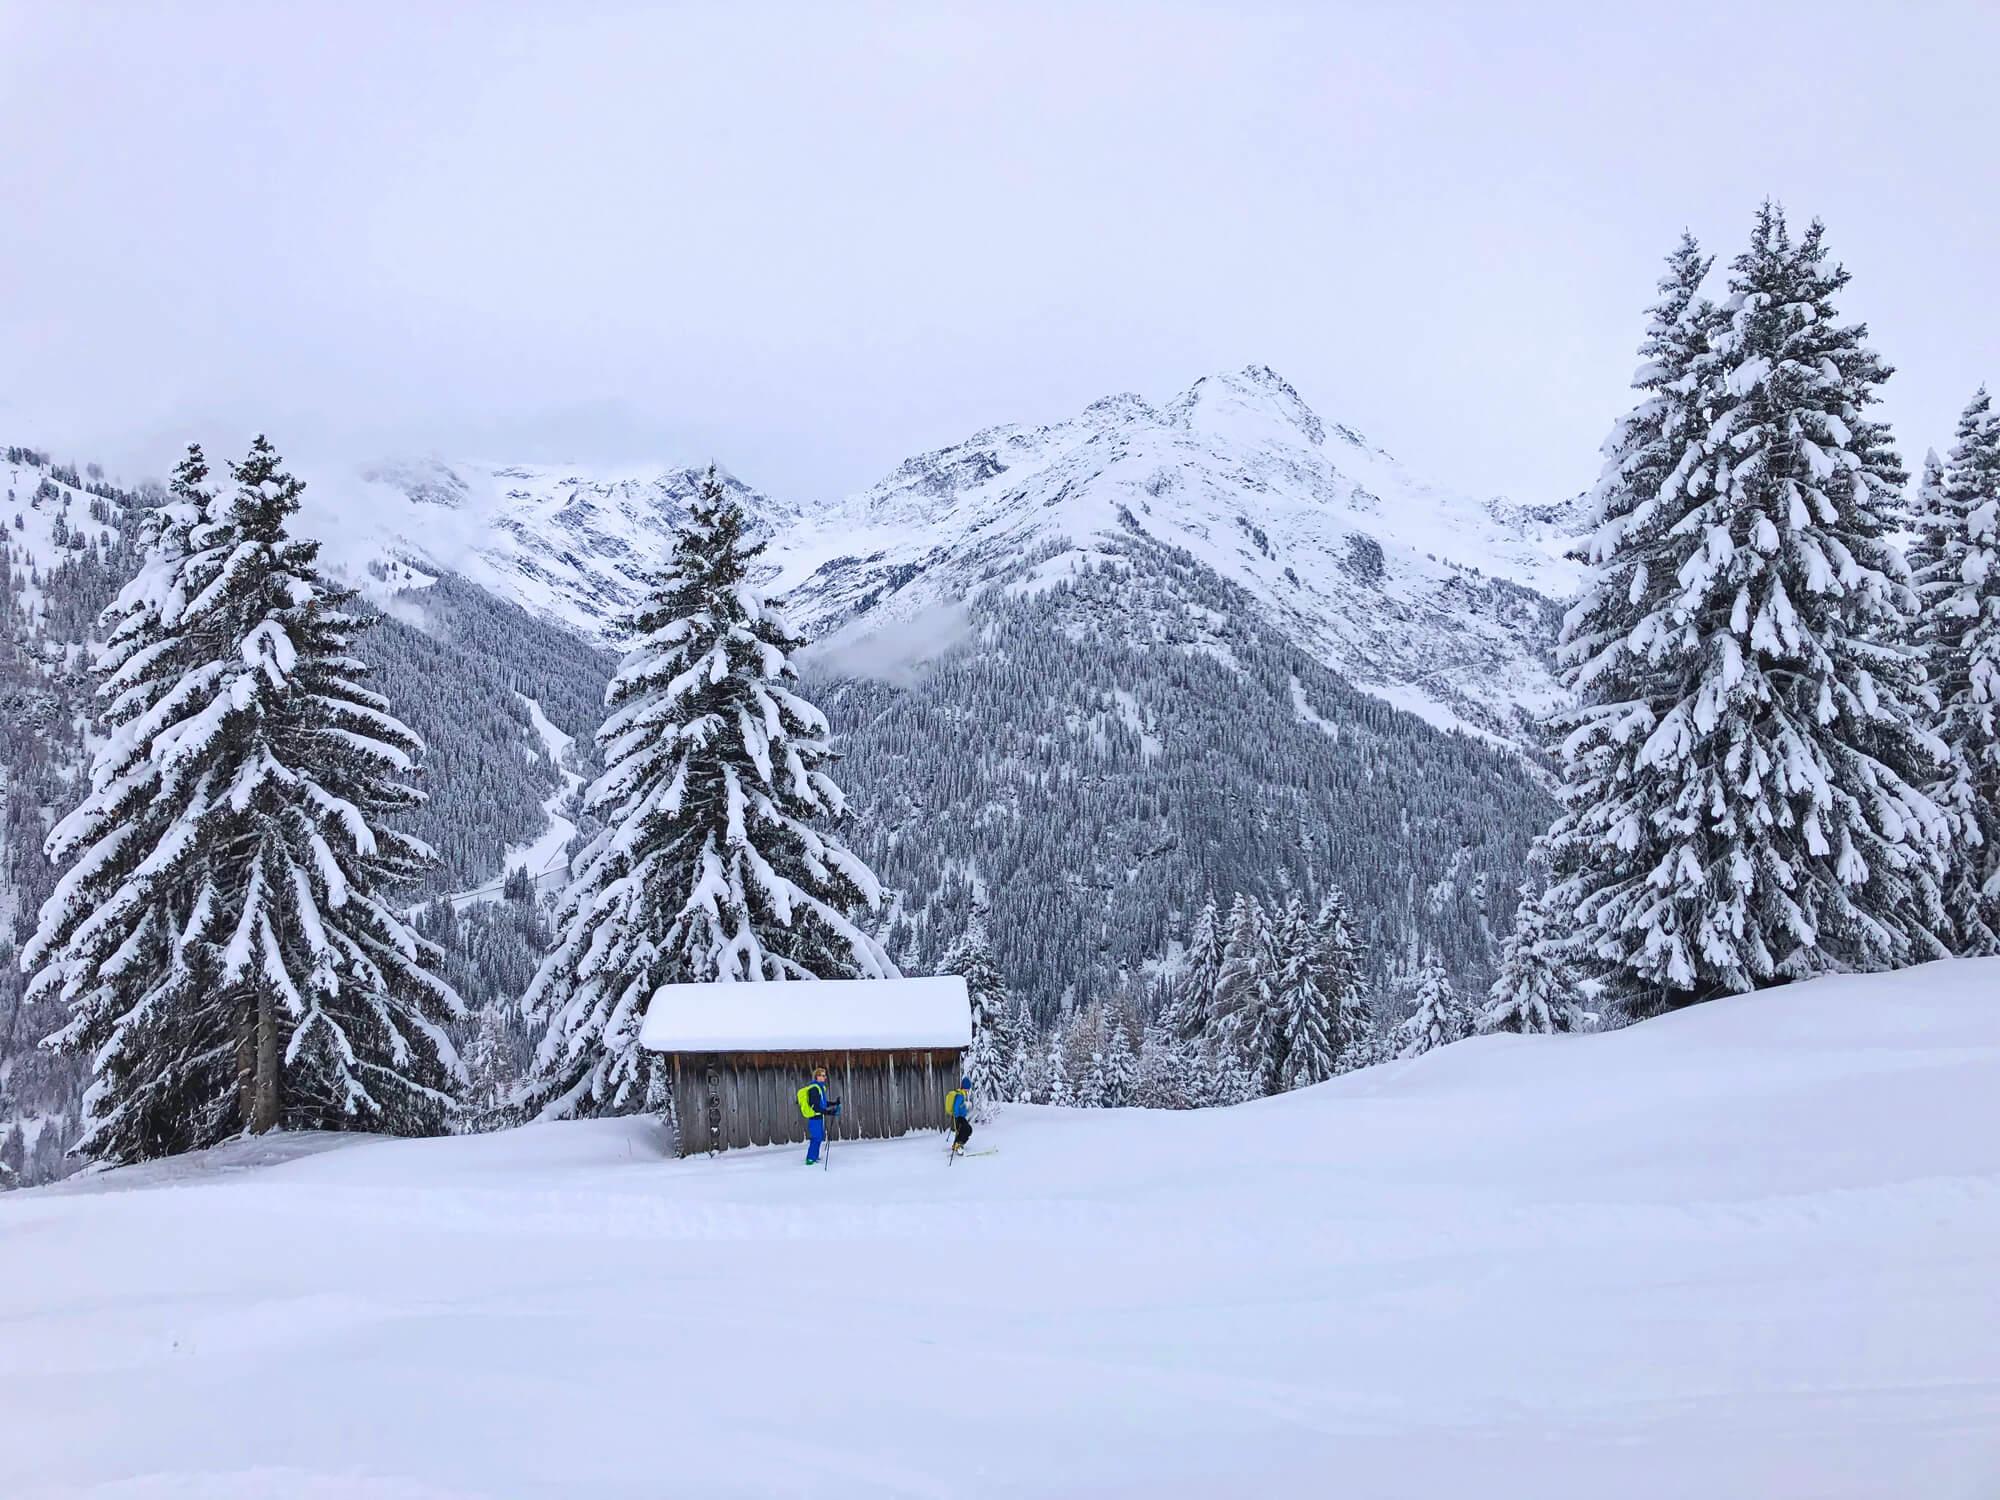 Skitourengehen mit Kindern I alpinonline